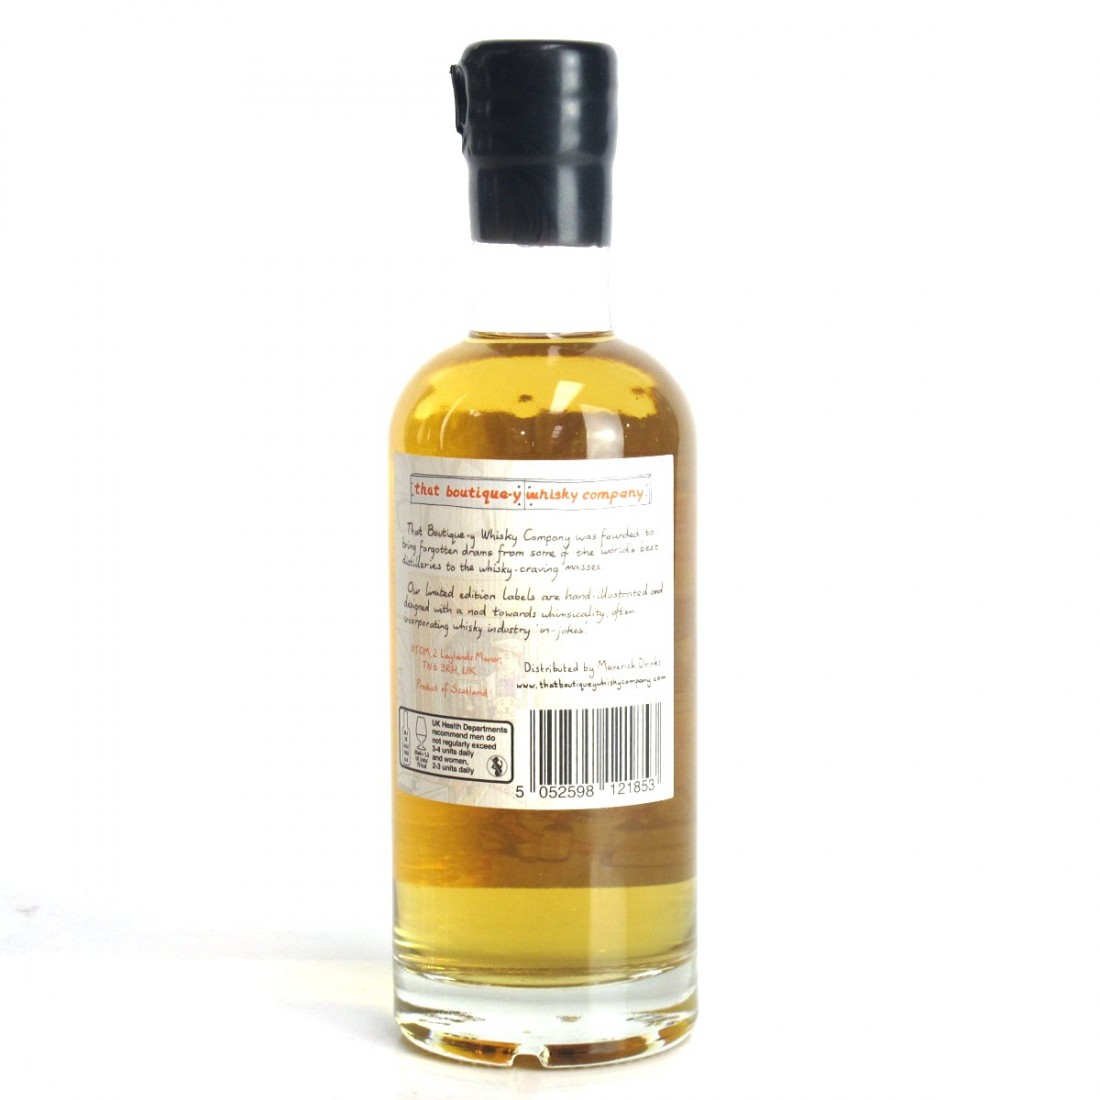 Bruichladdich That Boutique-y Whisky Company 15 Year Old Batch #7